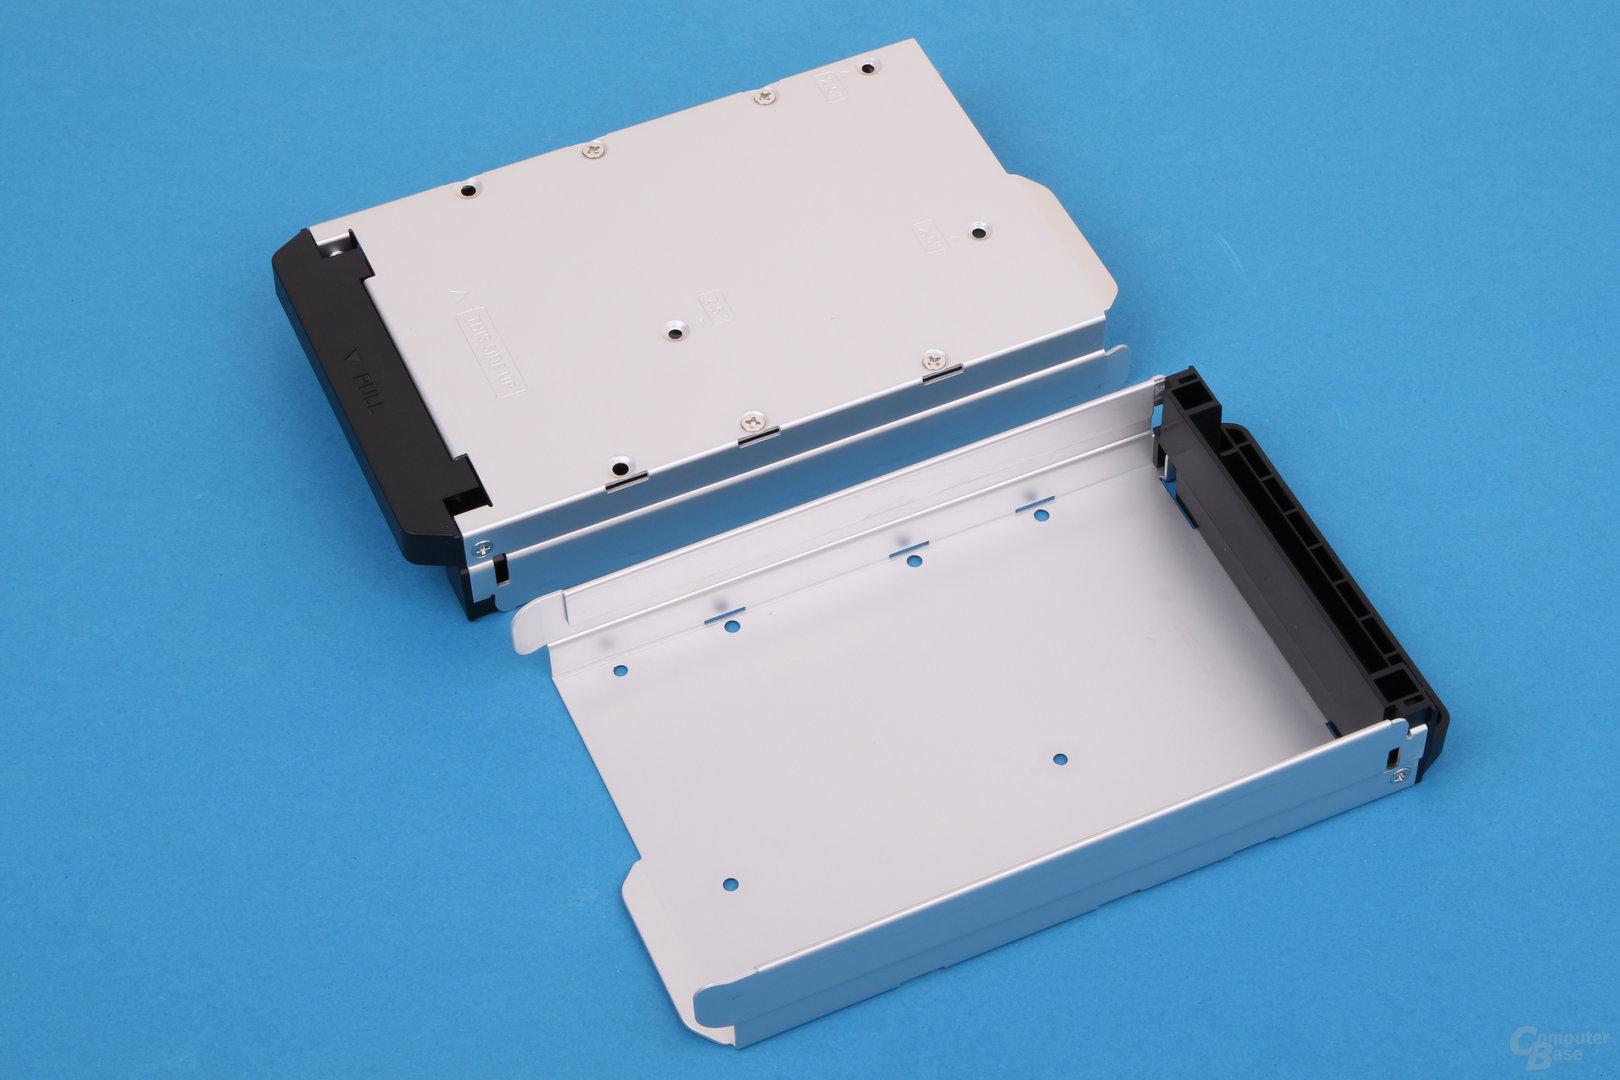 QNAP HS-210 im Test – Festplatteneinschübe